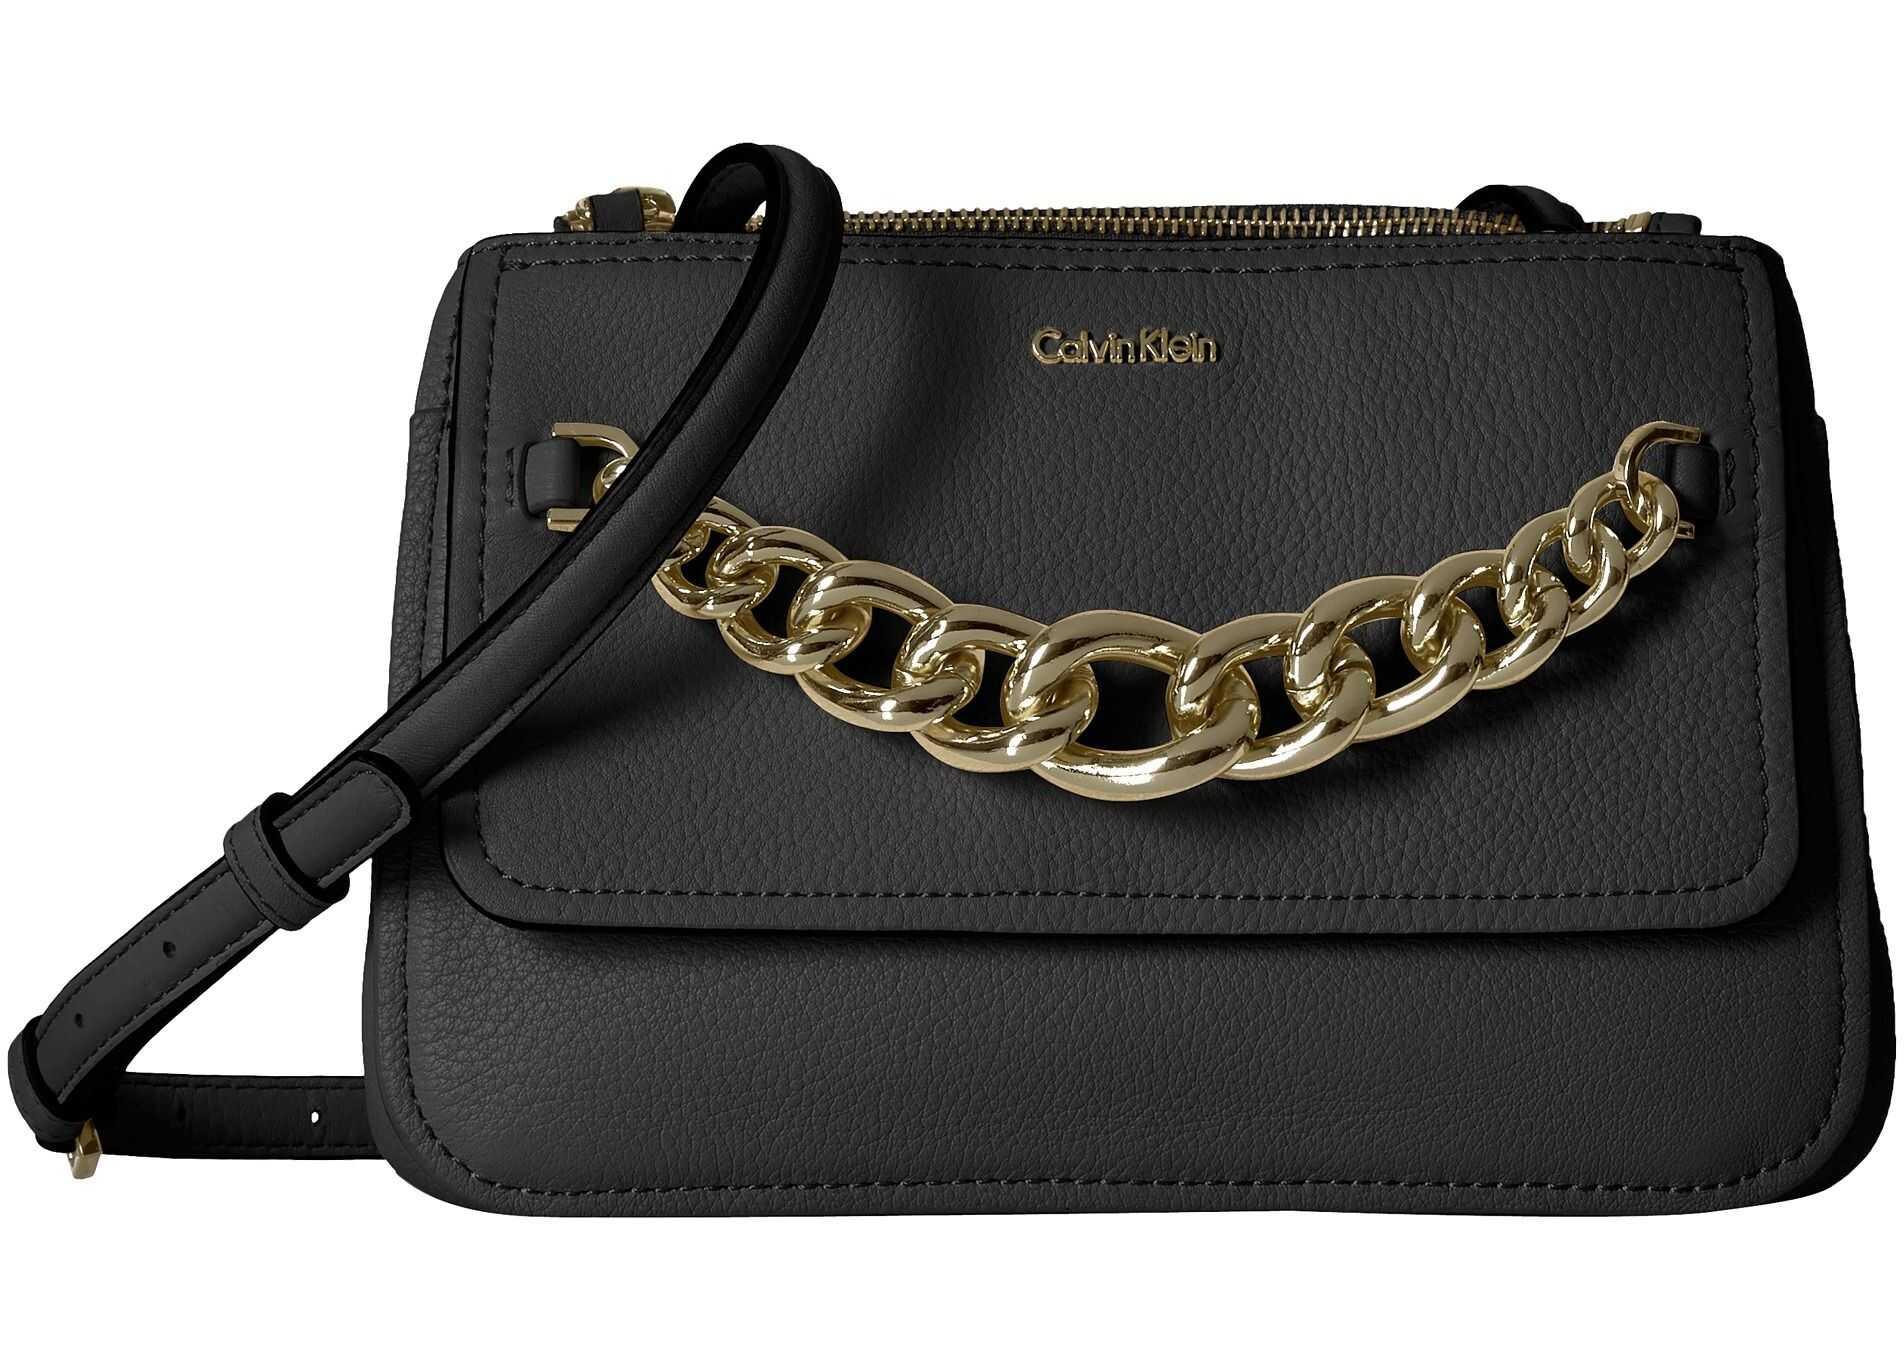 Calvin Klein Pebble Leather Flap Crossbody Black/Gold